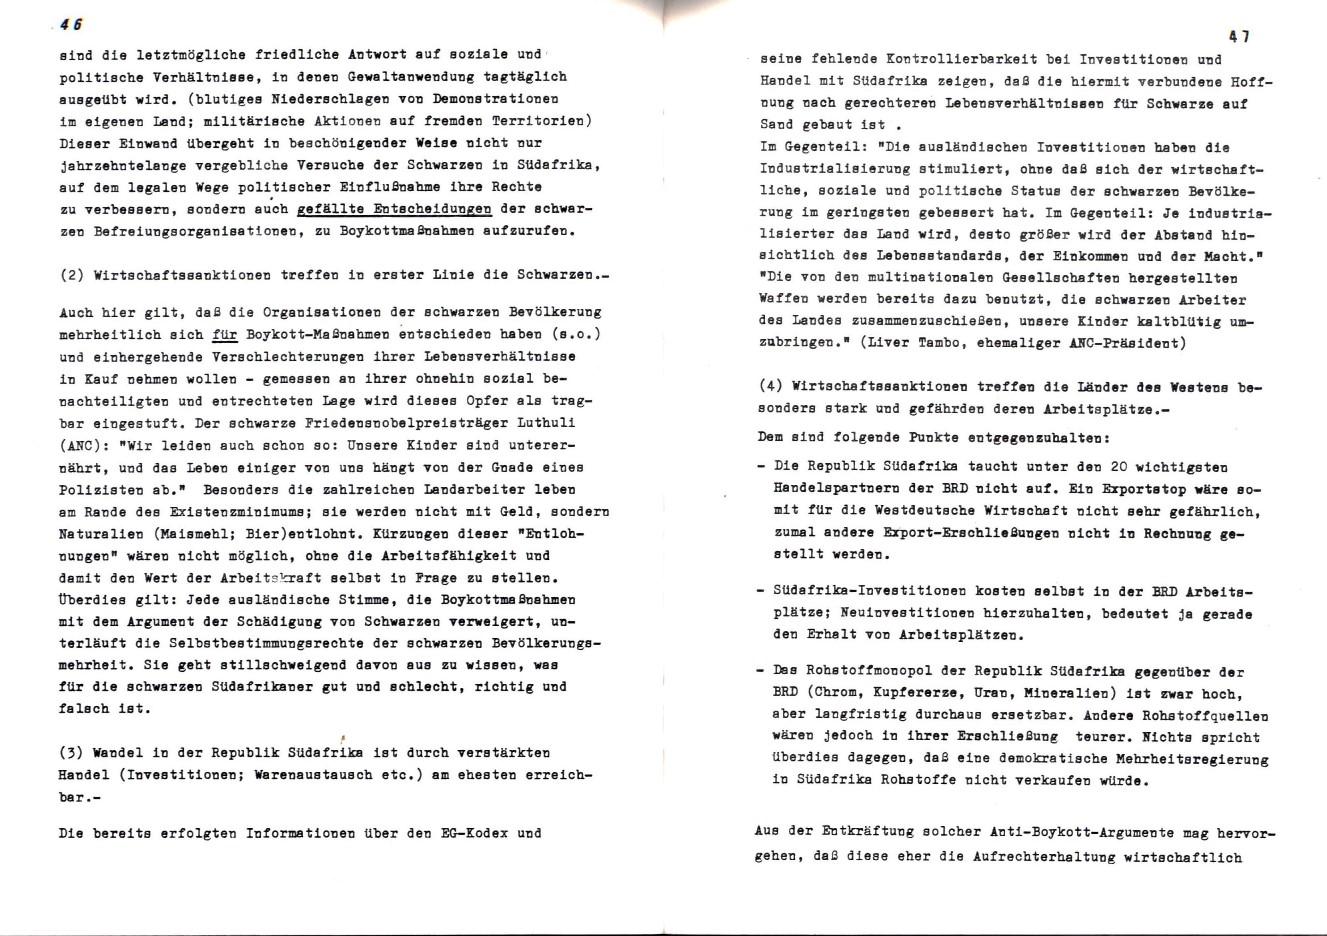 Muenster_AKAFRIK_1981_Suedafrika_BRD_25